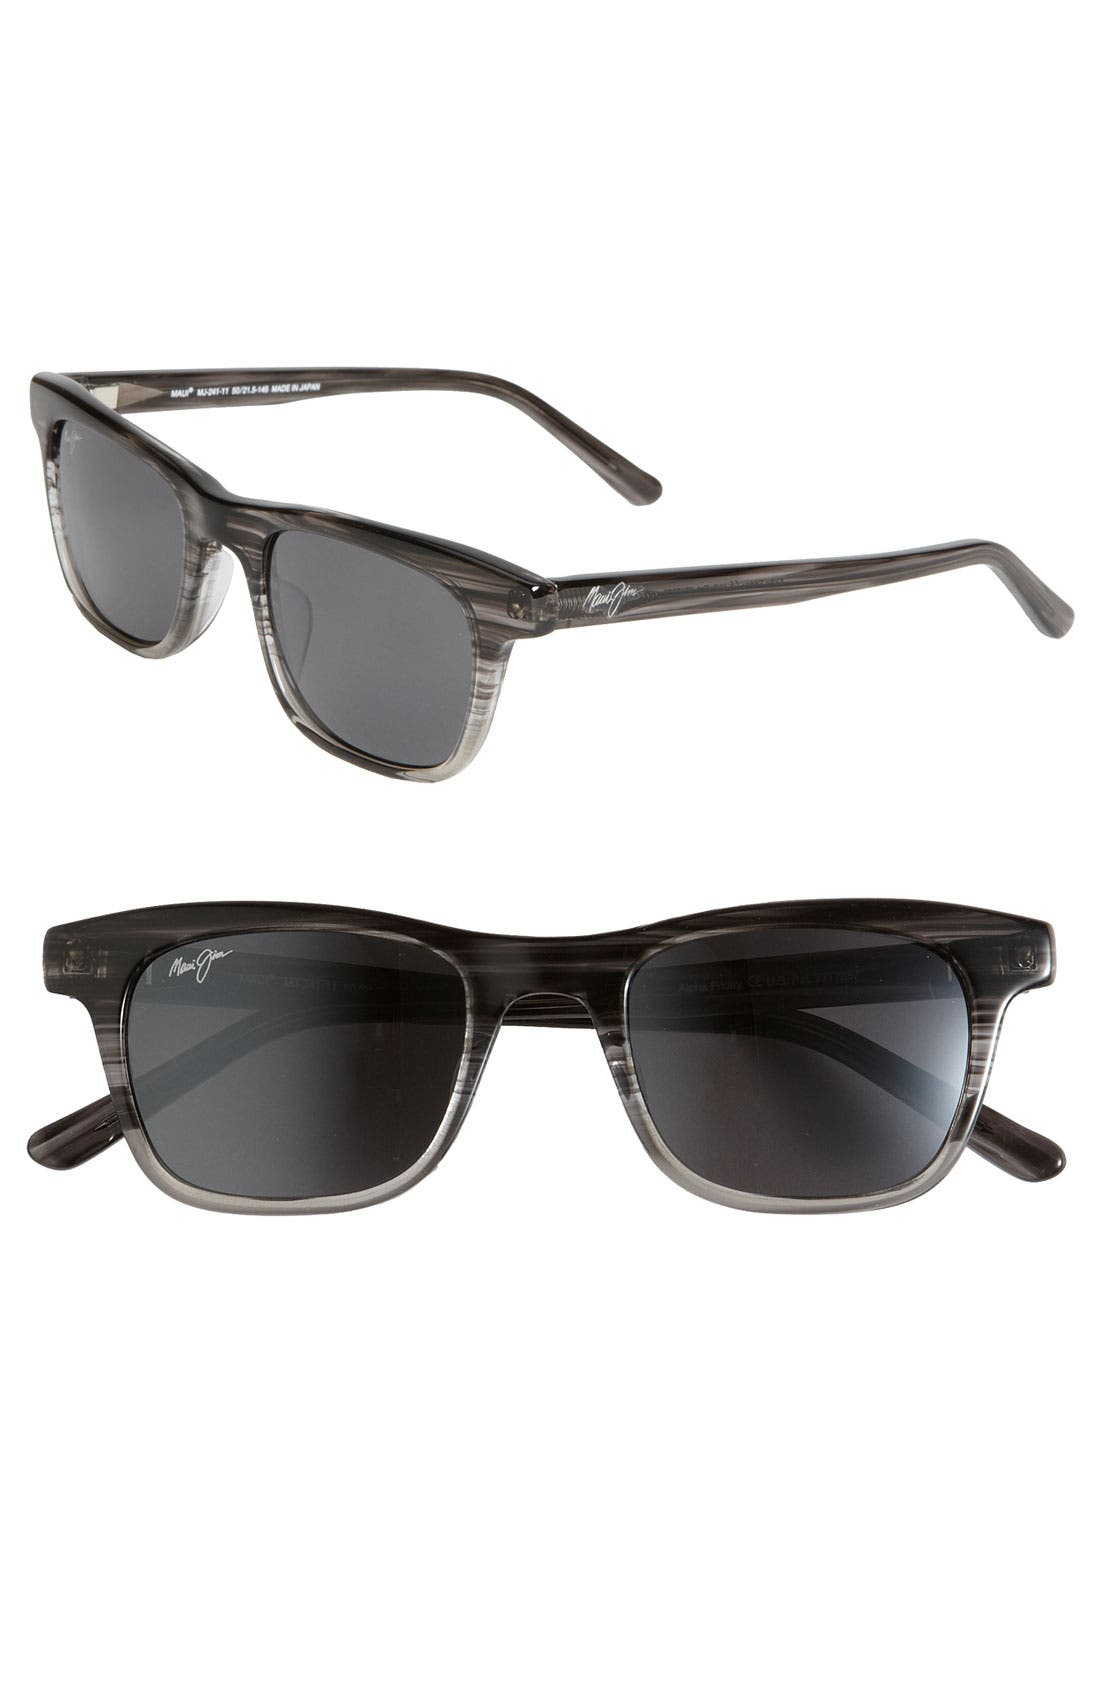 MAUI JIM 'Aloha Friday - PolarizedPlus<sup>®</sup>2' Retro Inspired Sunglasses, Main, color, 020